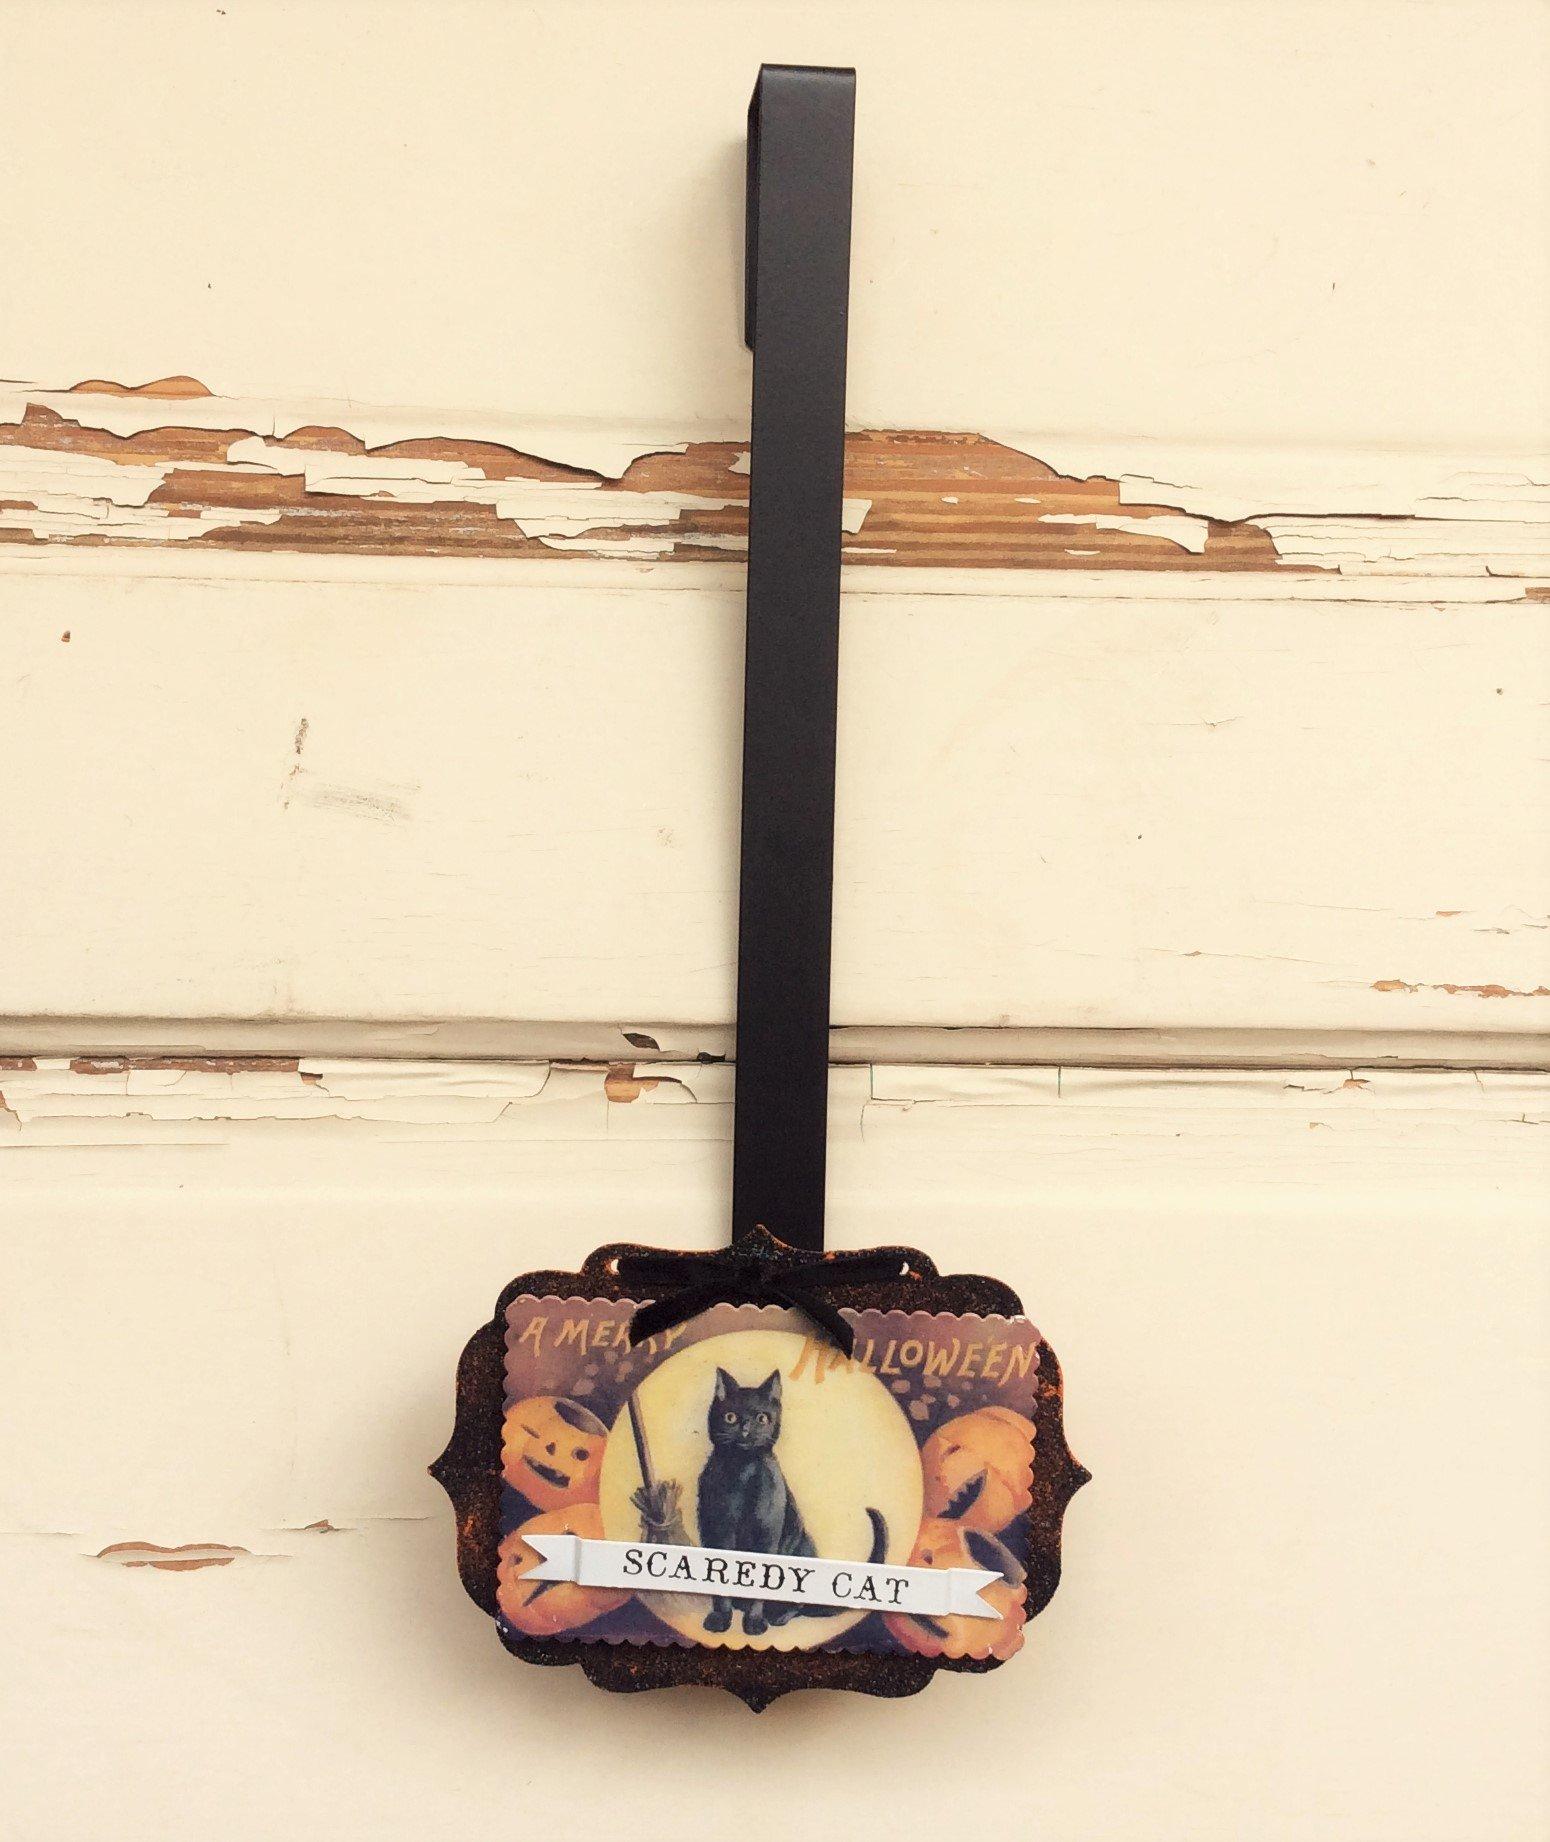 AG Designs Halloween Decor - Wreath Door Hanger Vintage Scaredy Cat #16OCT16 by Agape Gifts Designs (Image #1)